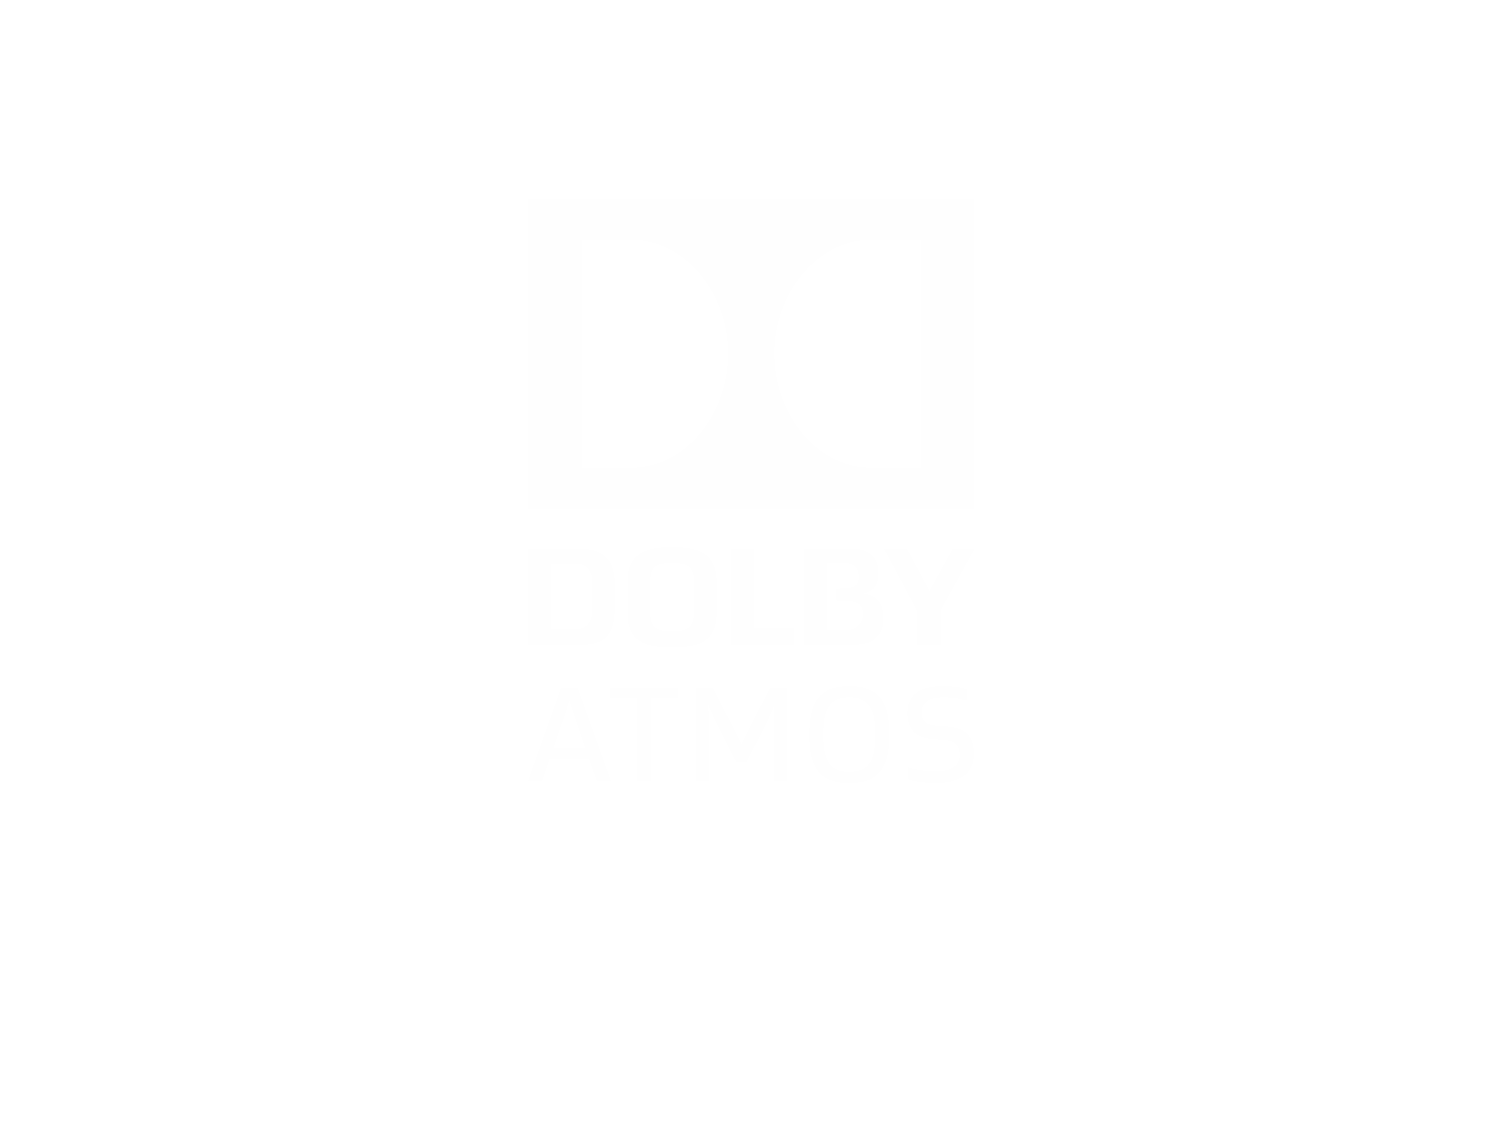 43 кинозала с Dolby Atmos